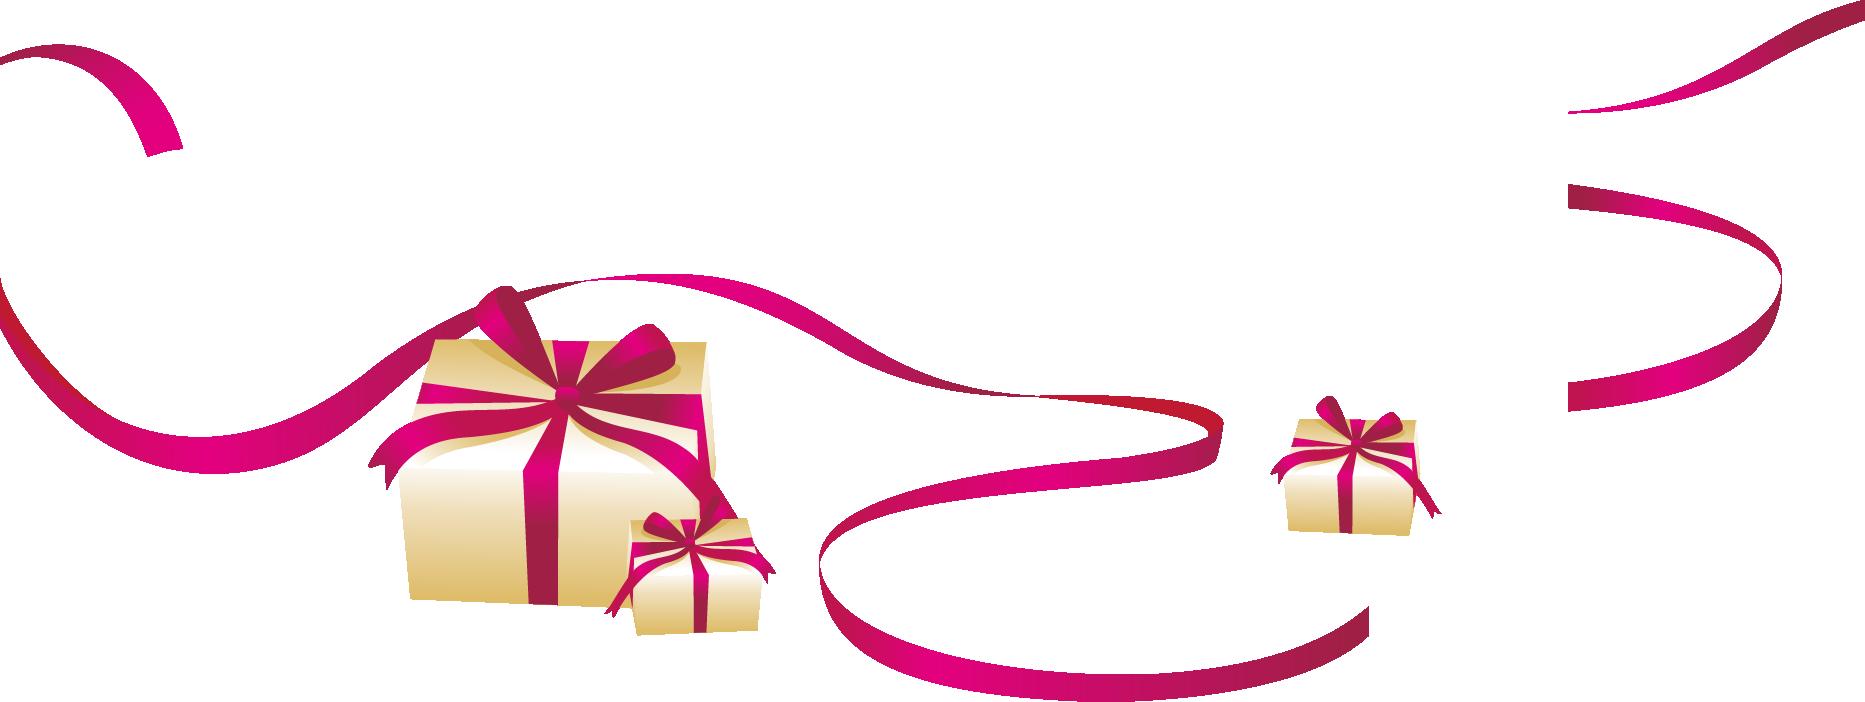 Clipart balloon ribbon. Borders and frames birthday